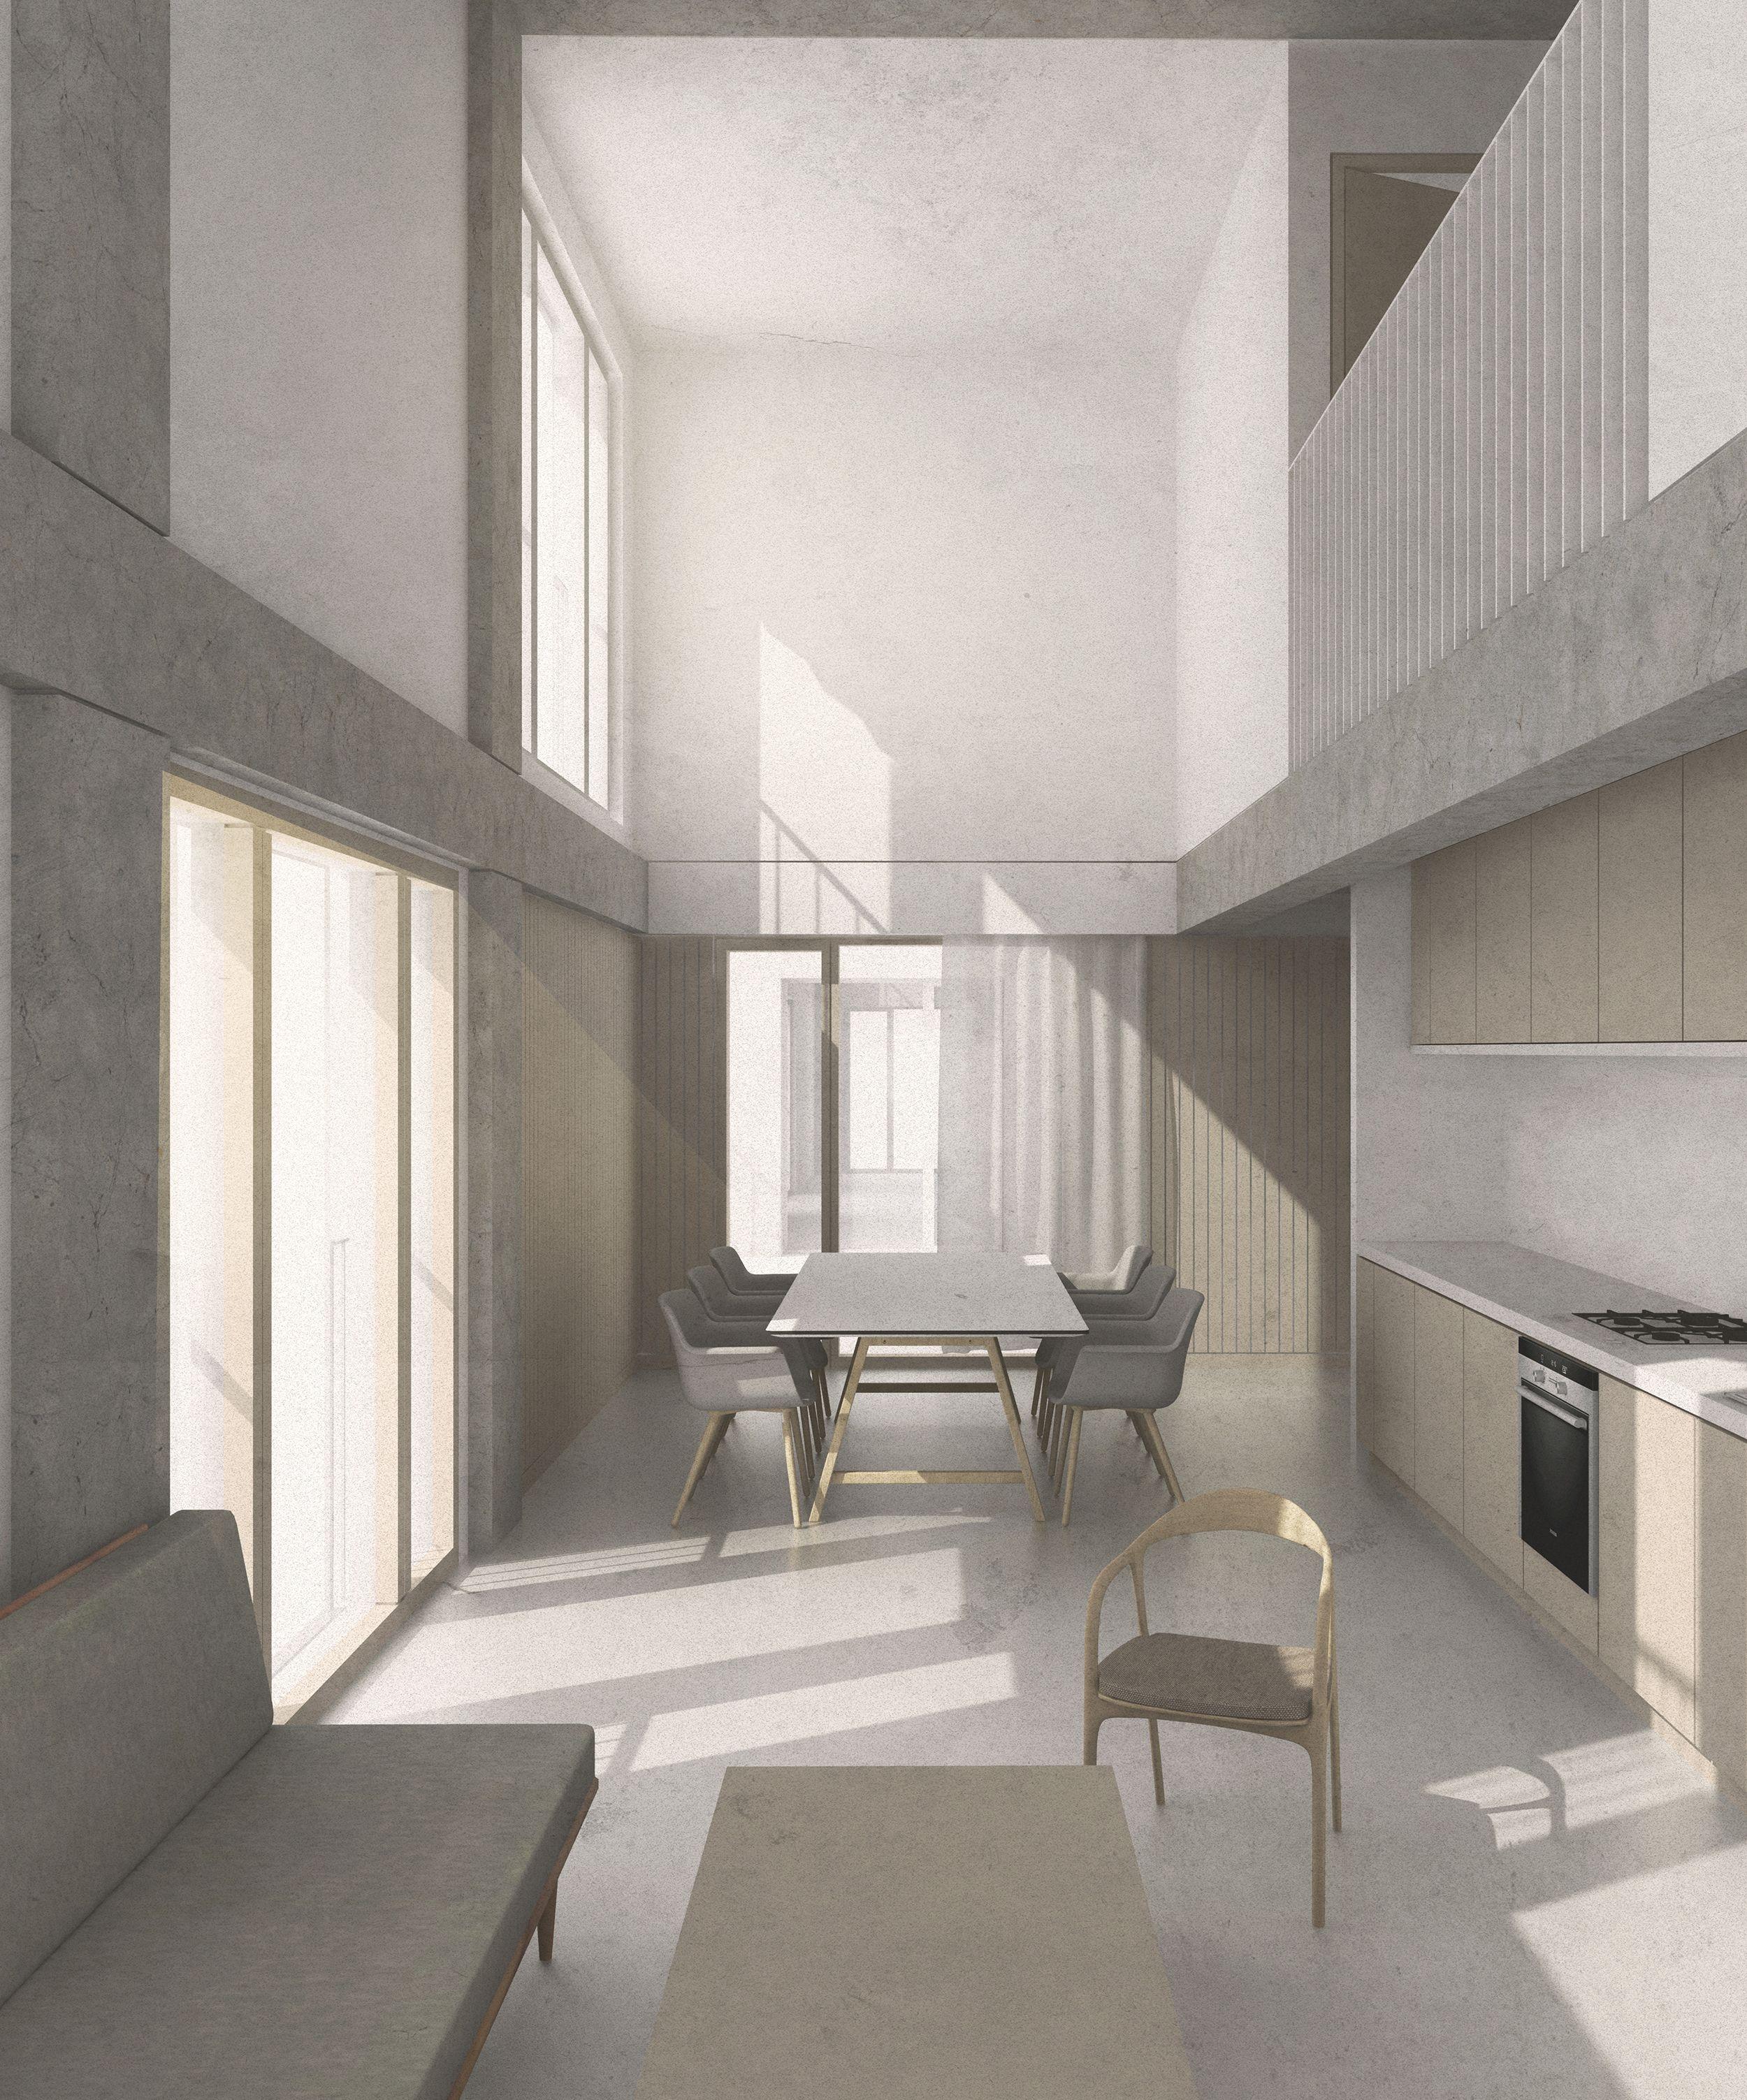 Interior Flexible Cooperative Housing In Hackney Wick Karabo Turner, Diploma